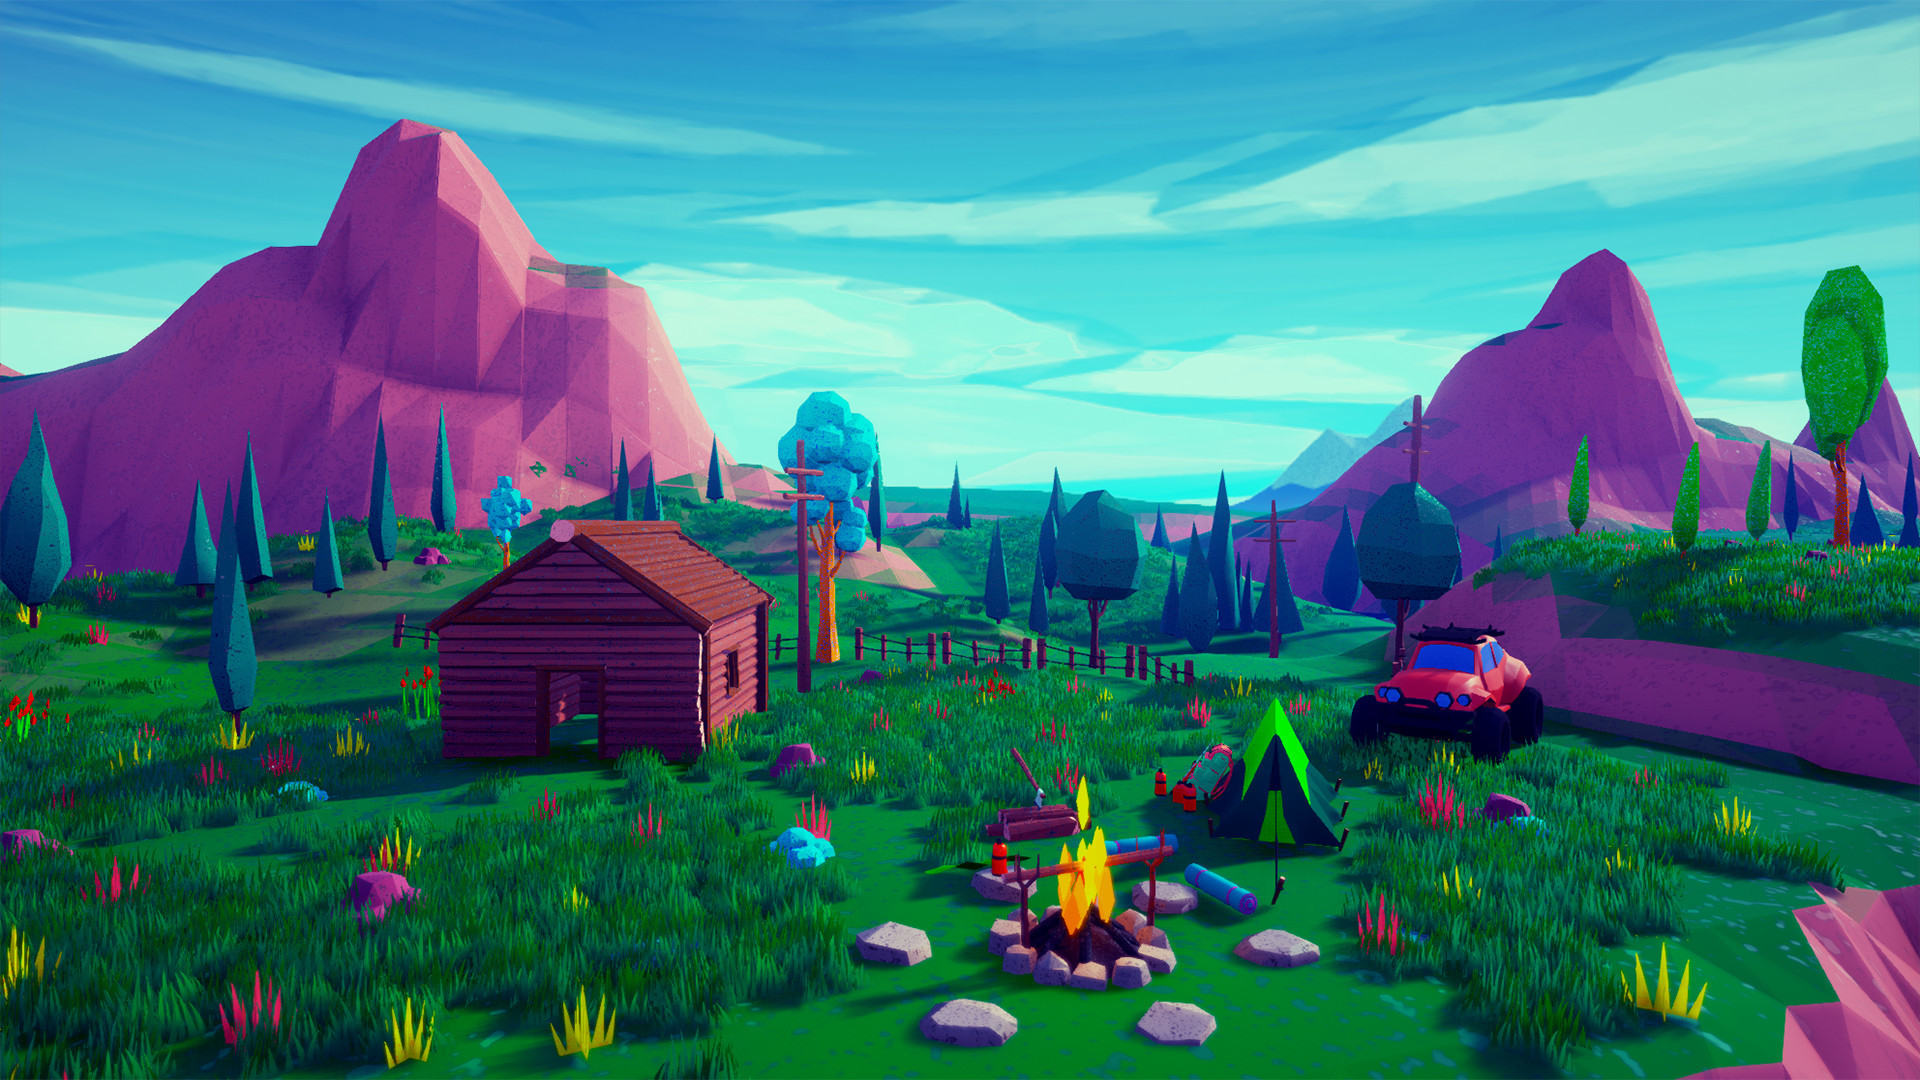 ArtStation - Lowpoly Stylized Project / Unreal Engine, Emek